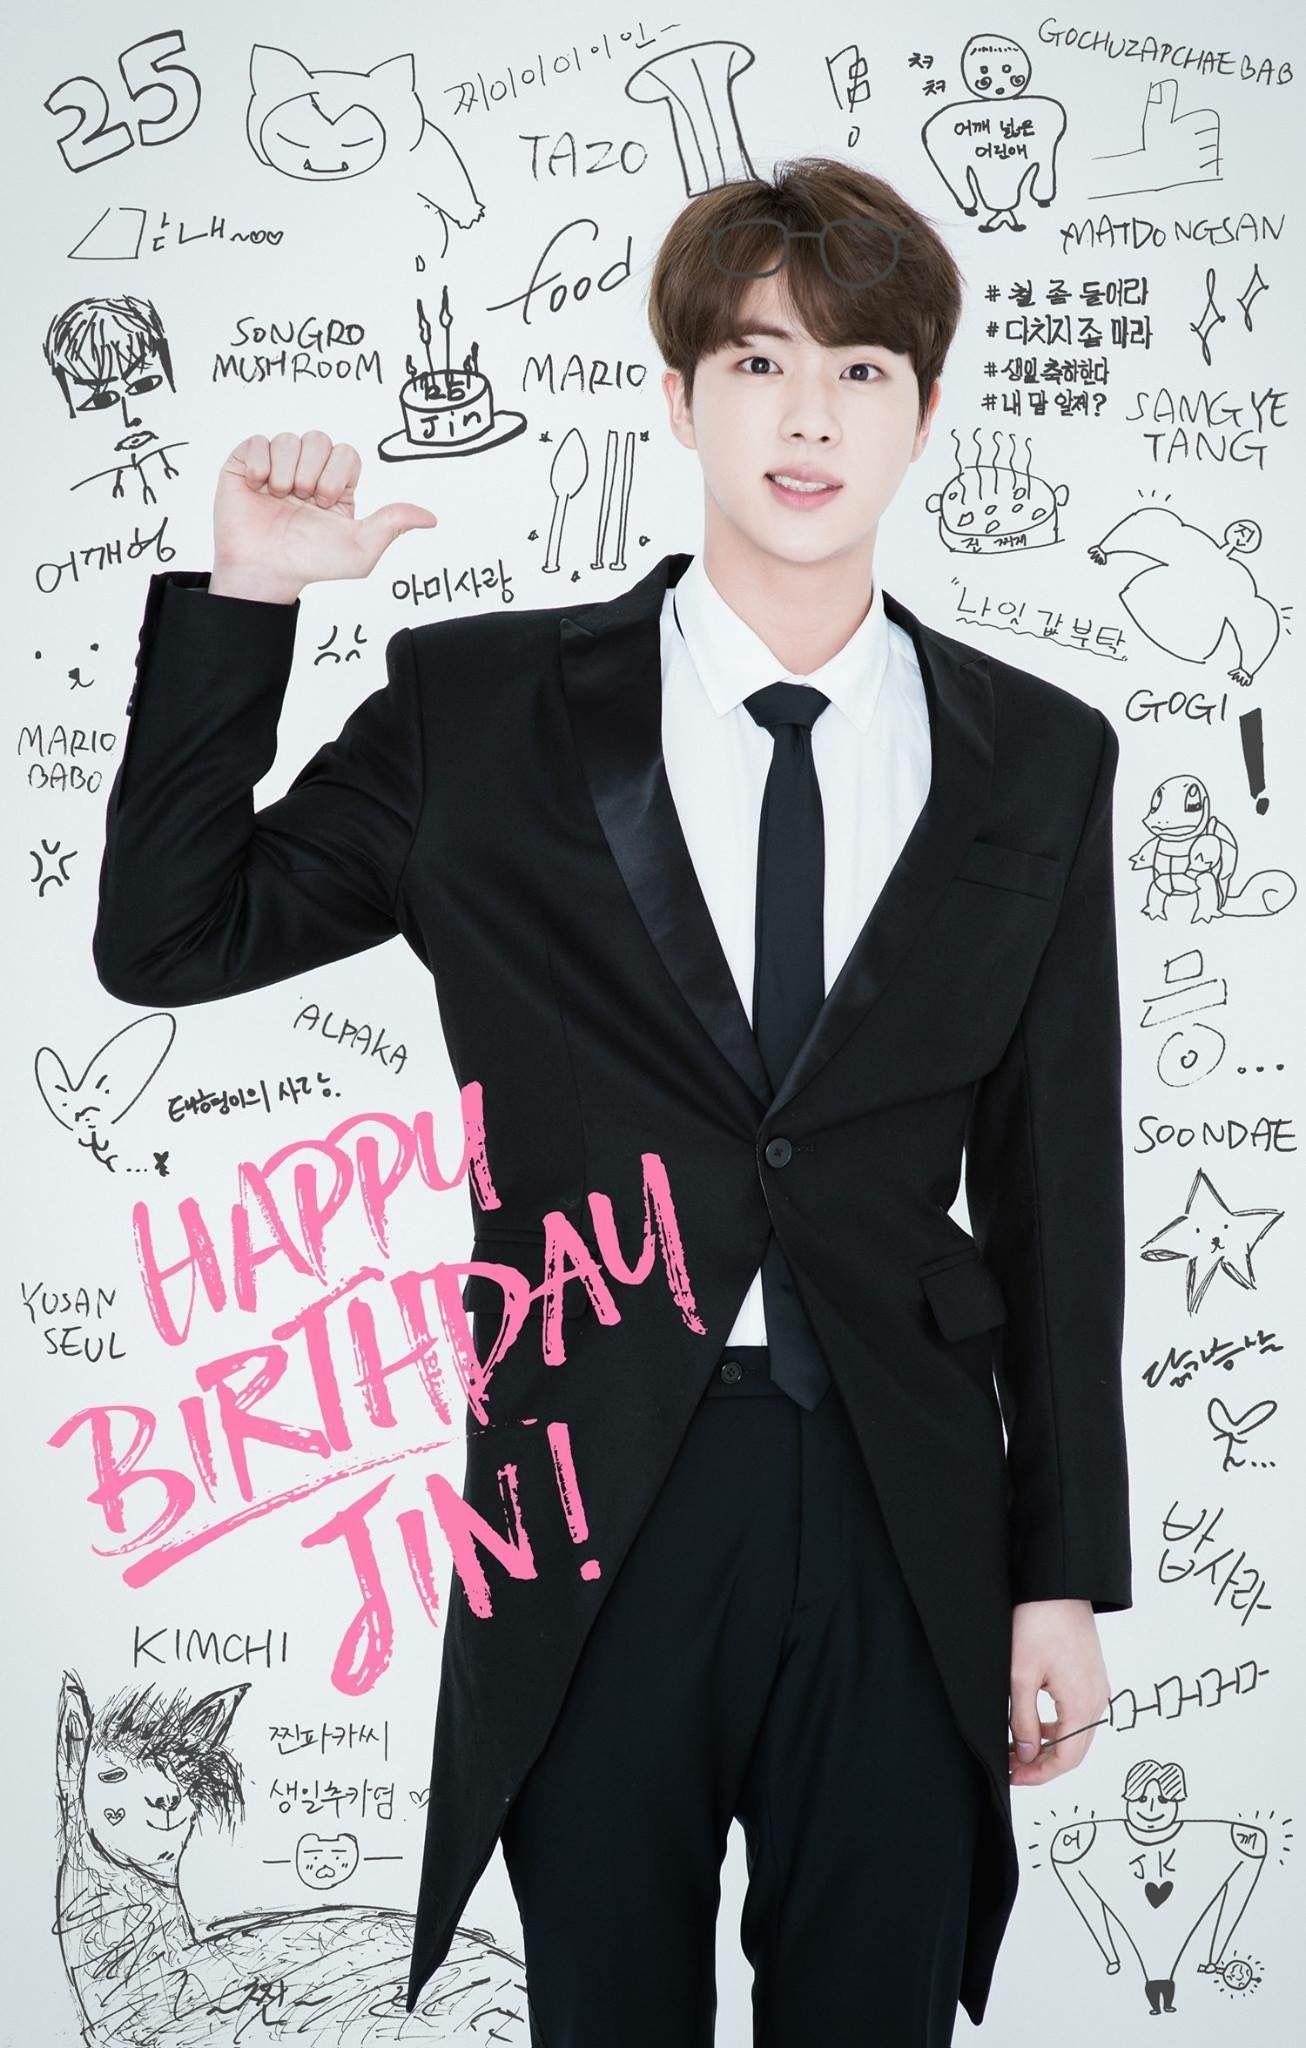 Happy birthday Princess Jin